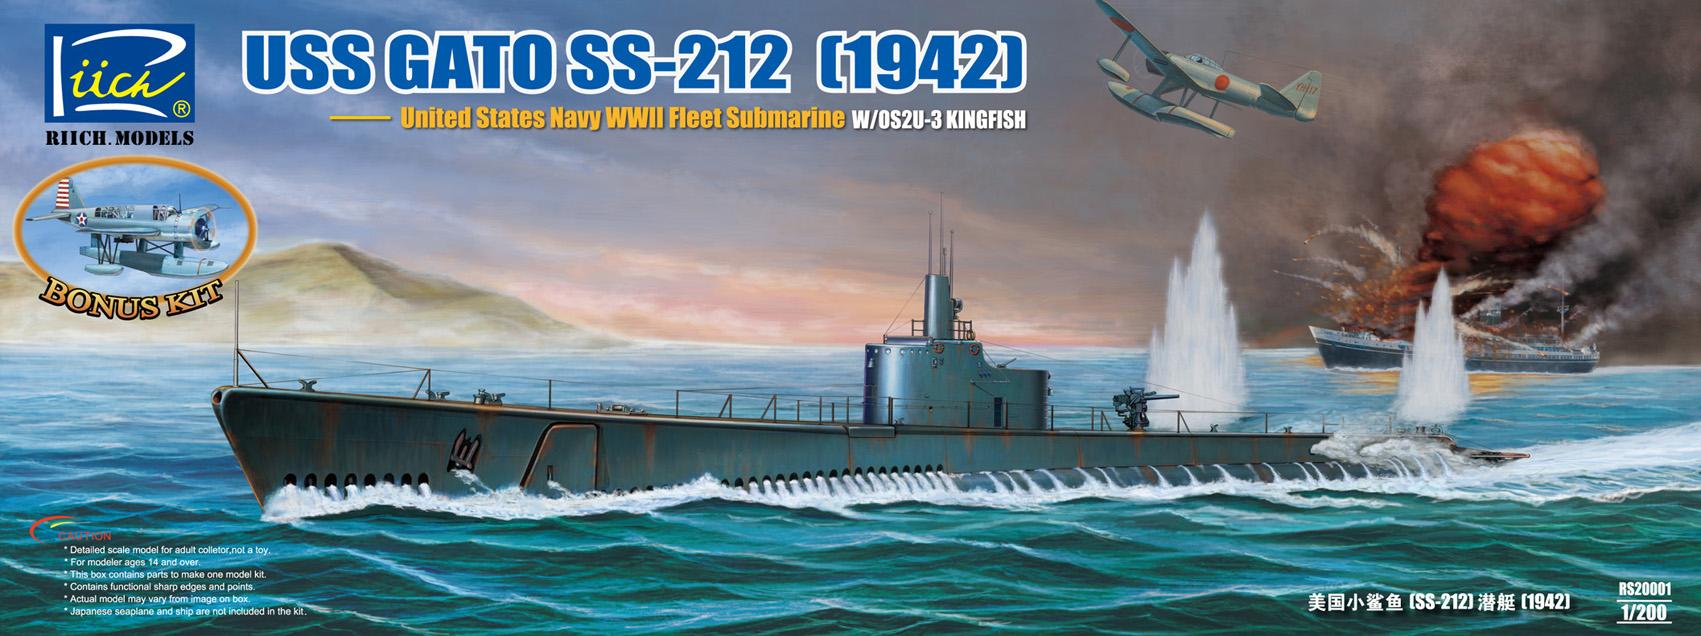 Riich 1/200 USS Gato SS-212 Fleet Submarine 1942+ OS2U-3 Kingfisher Floatplane